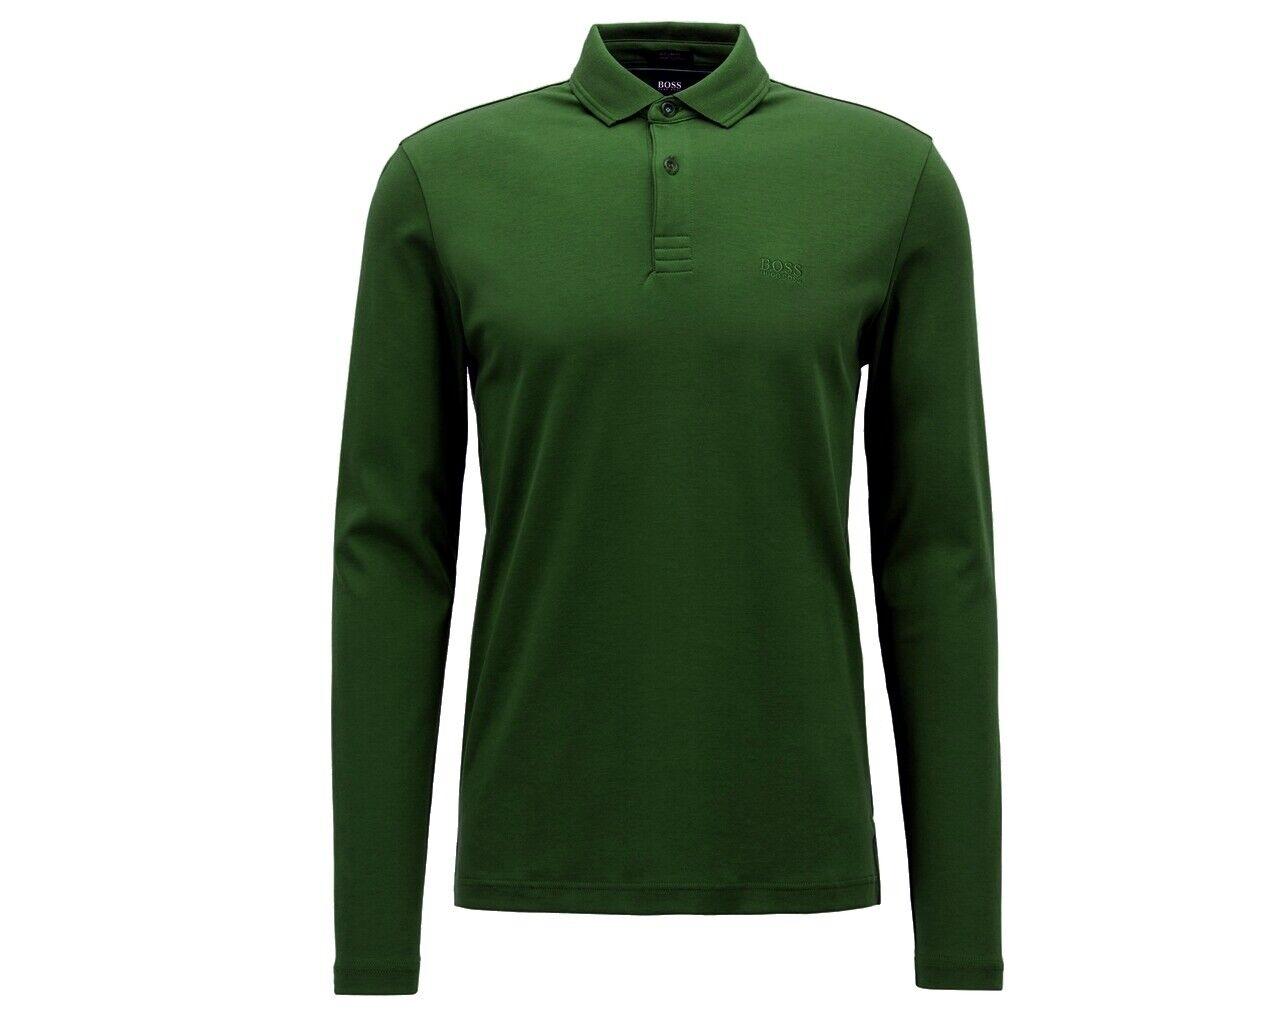 Sale Hugo Boss Pirol 50392723 348 Long Sleeves Mens Polo Shirt Grün Top